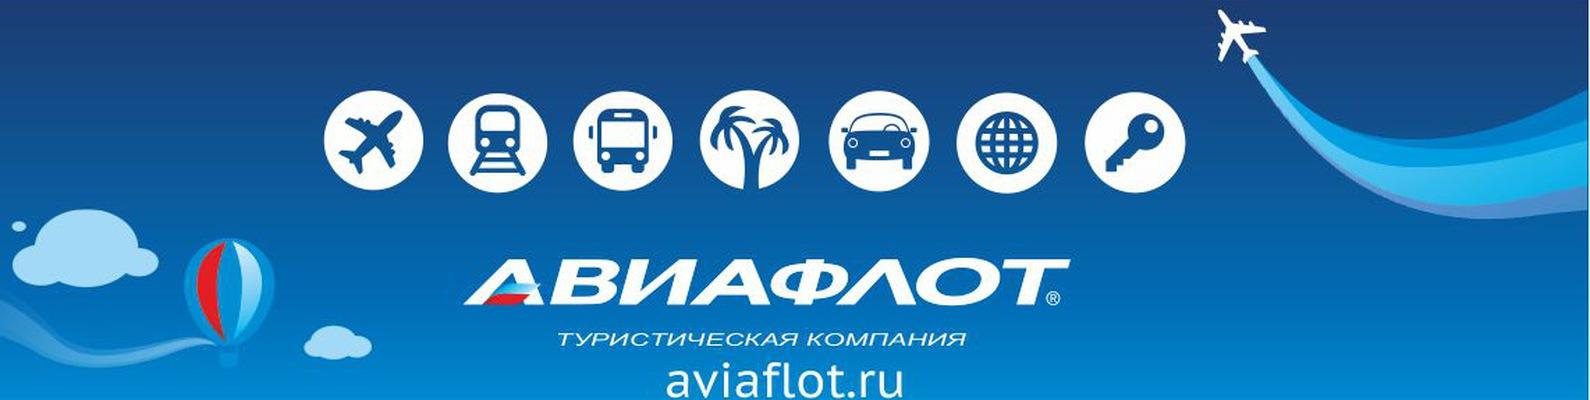 Билет на самолет москва барнаул цена aviaflot.ru ютэйр авиабилеты купить билеты